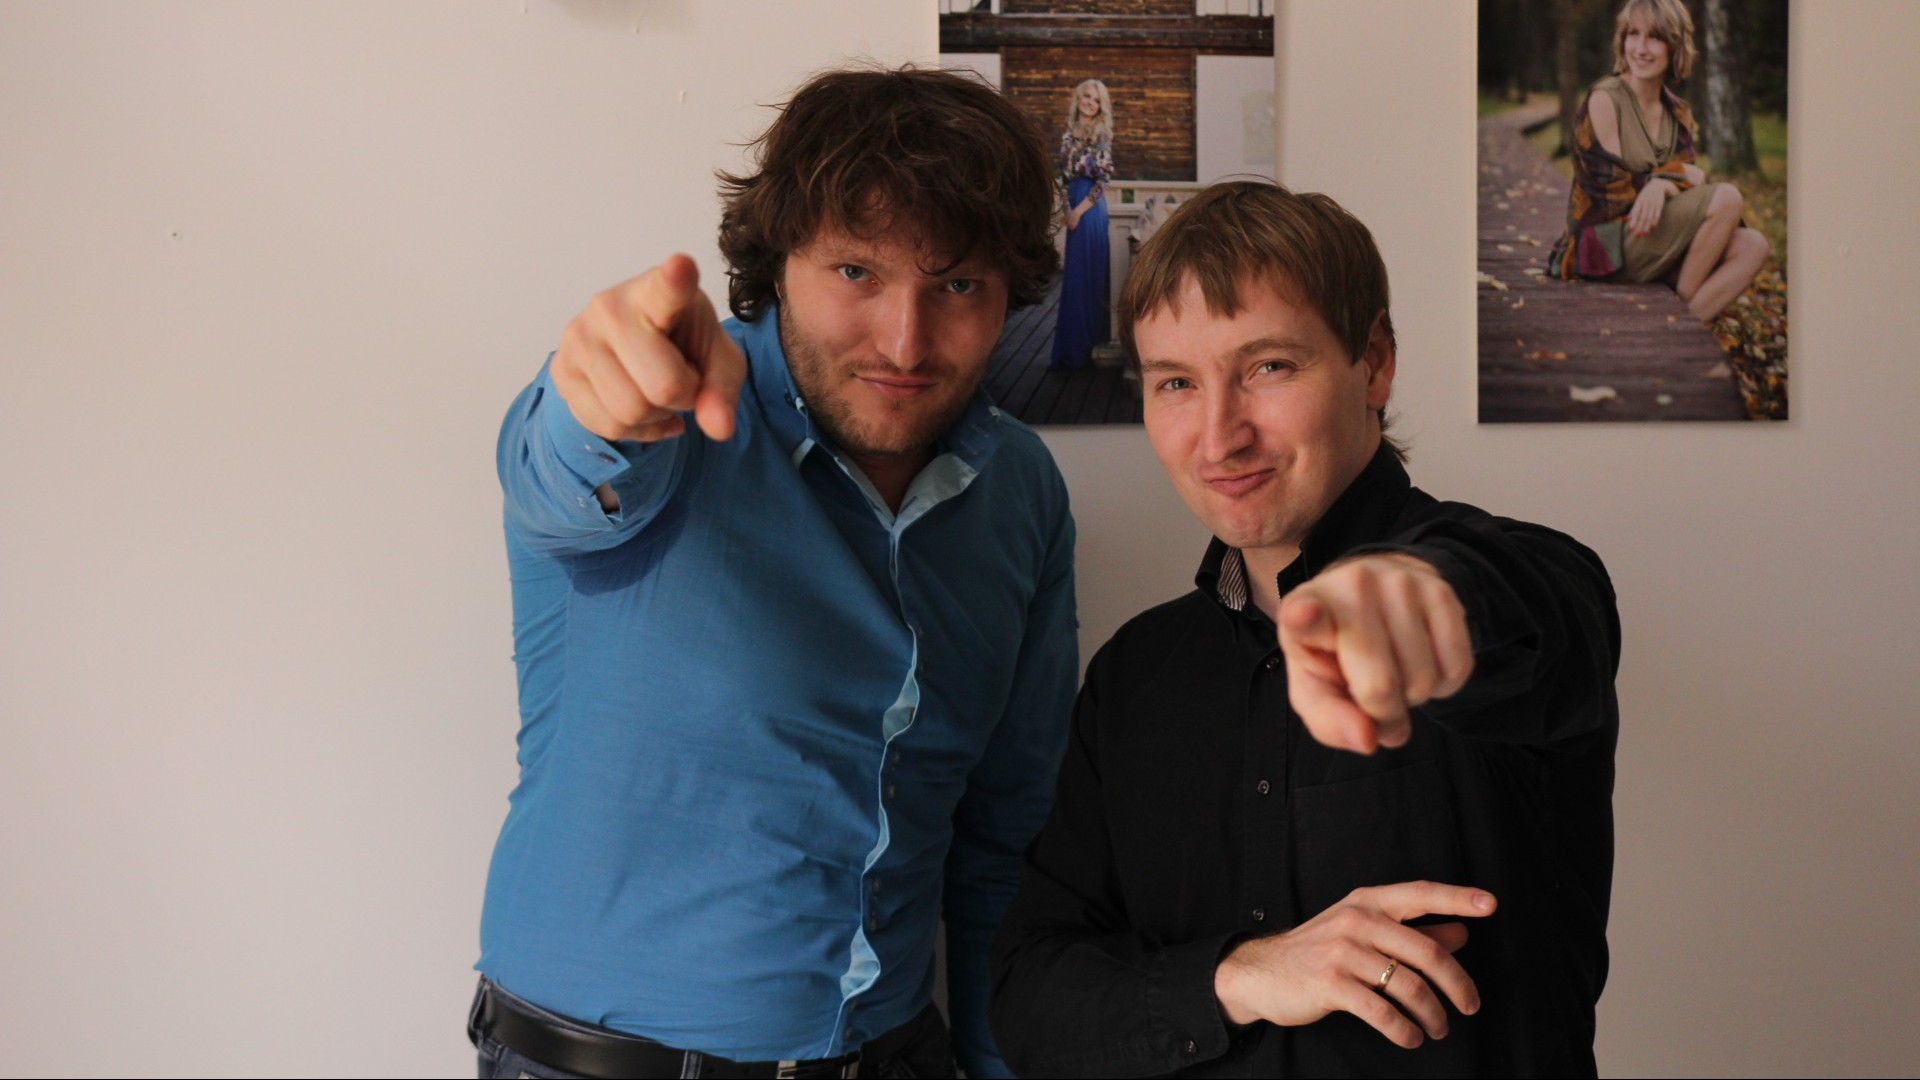 Видеограф Вадима Карнель Москва и видеооператор